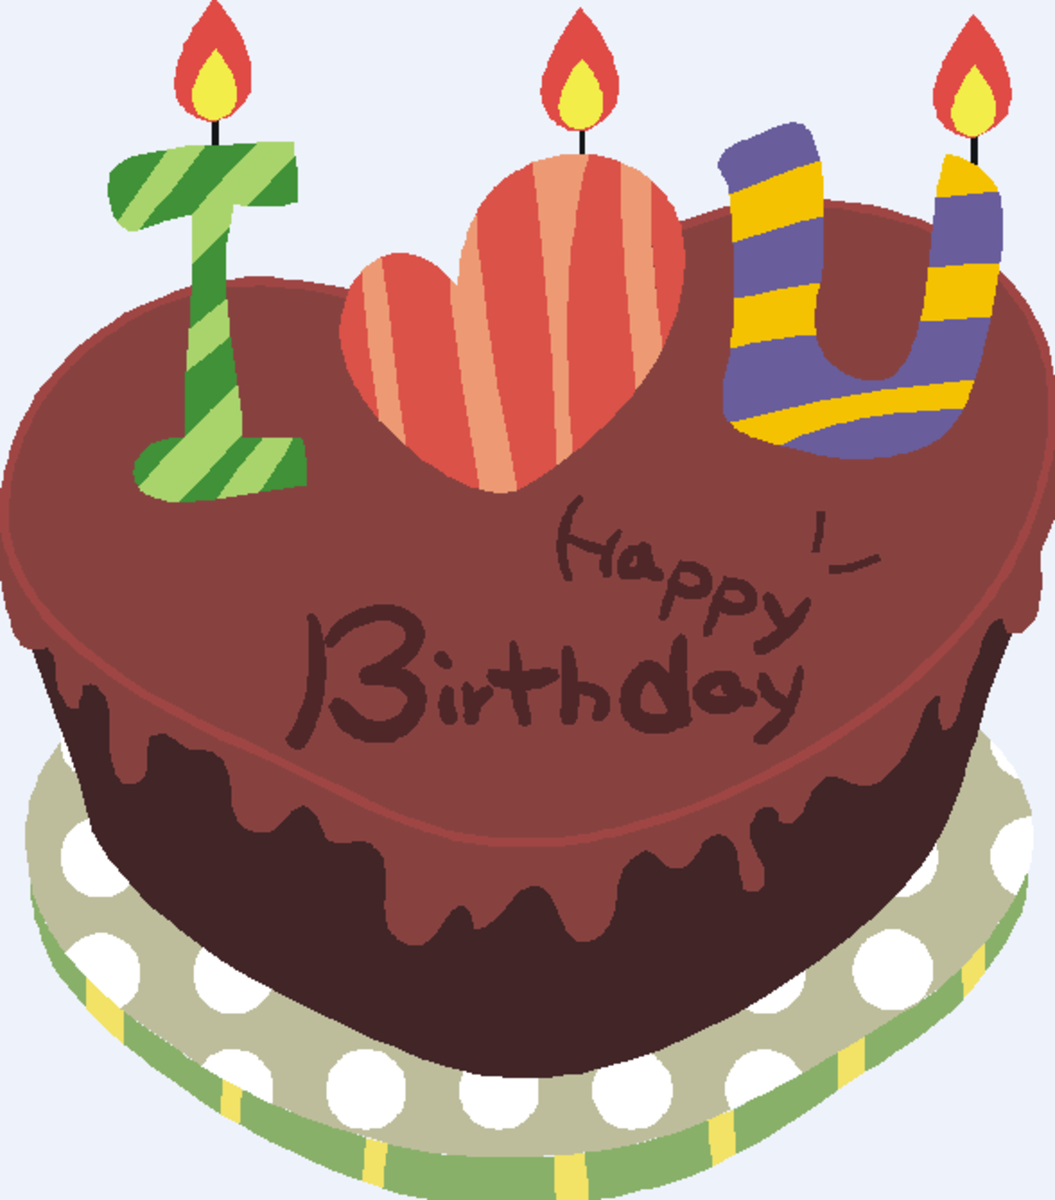 'I  ♥  U' on Chocolate Happy Birthday Cake